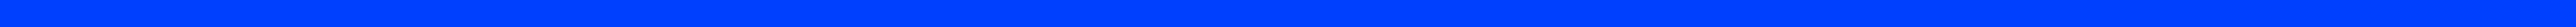 Blue Divider Bar Kentucky Transportation Center